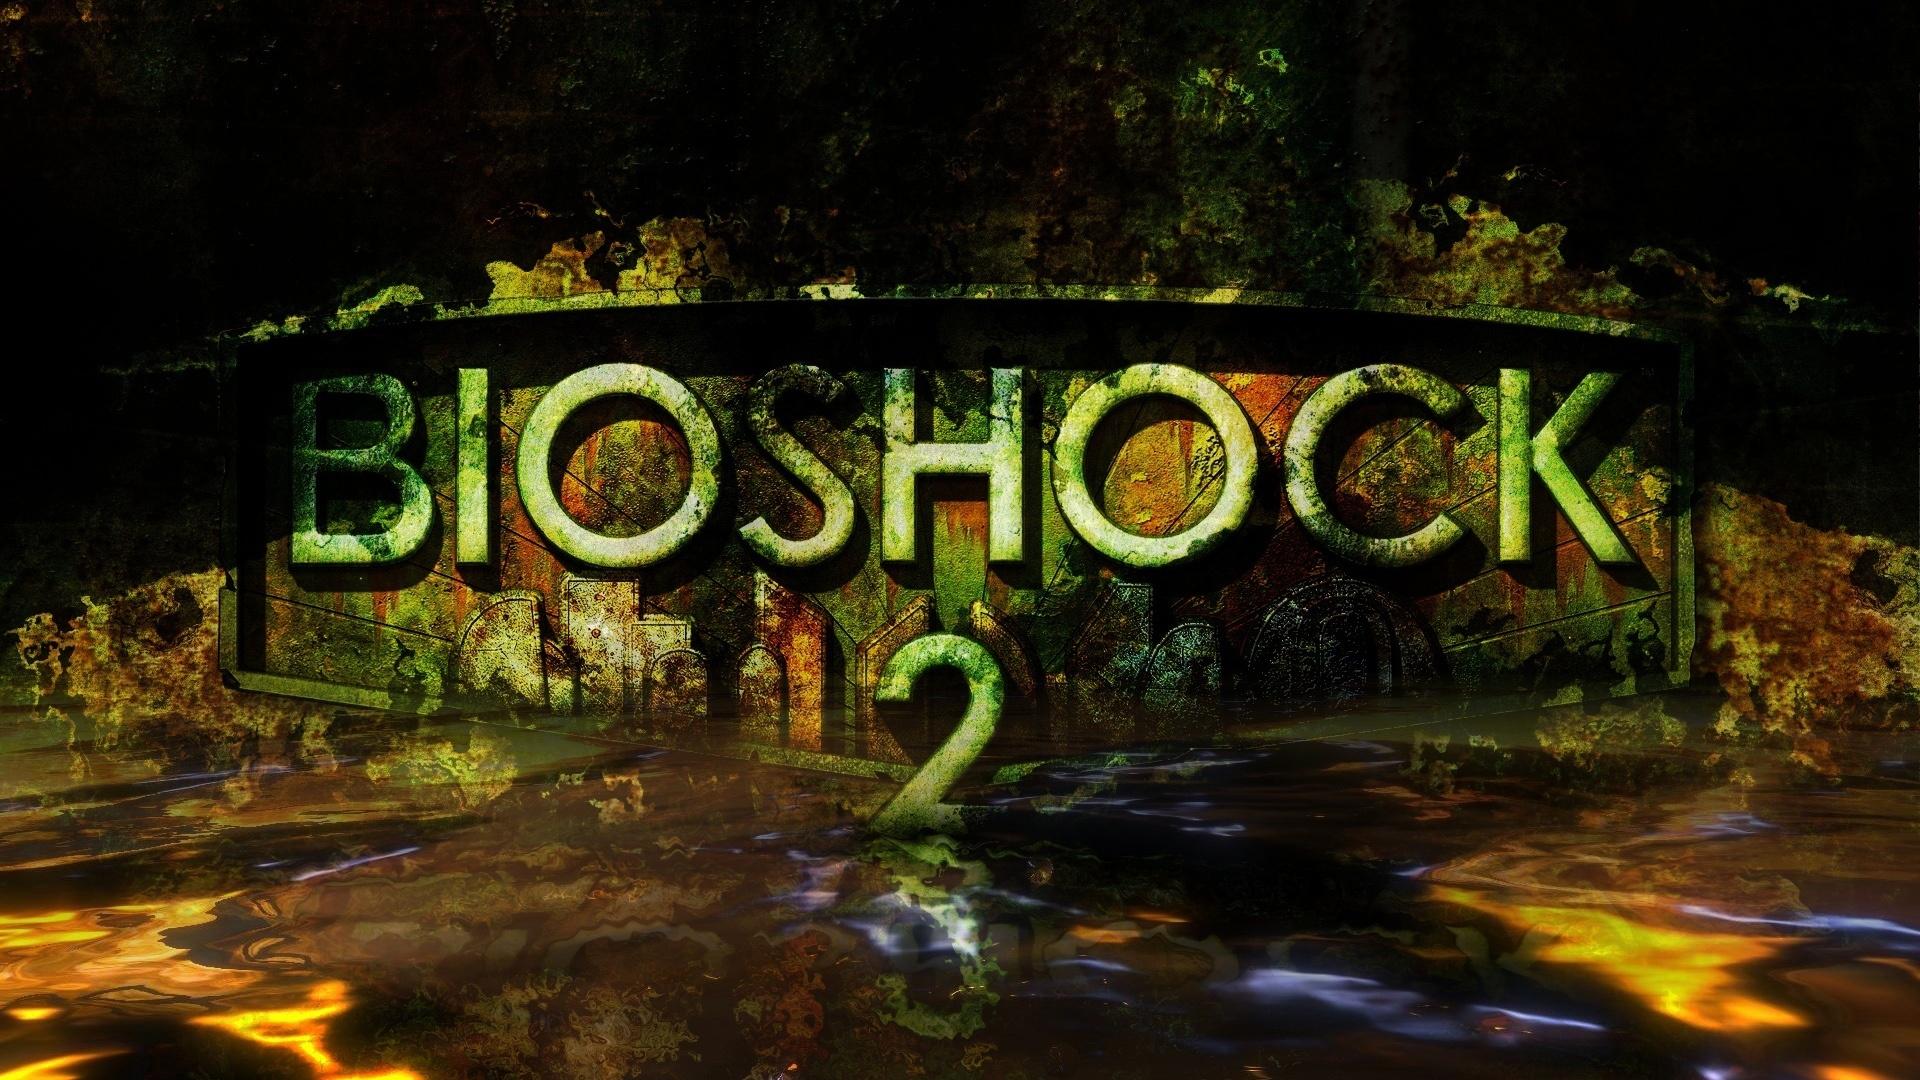 http://2.bp.blogspot.com/-kWDLblndtTM/UDJPC6g1eGI/AAAAAAAAHaI/98vdLpO2gvc/s0/bioshock-2-video-game-1920x1080-wallpaper.jpg